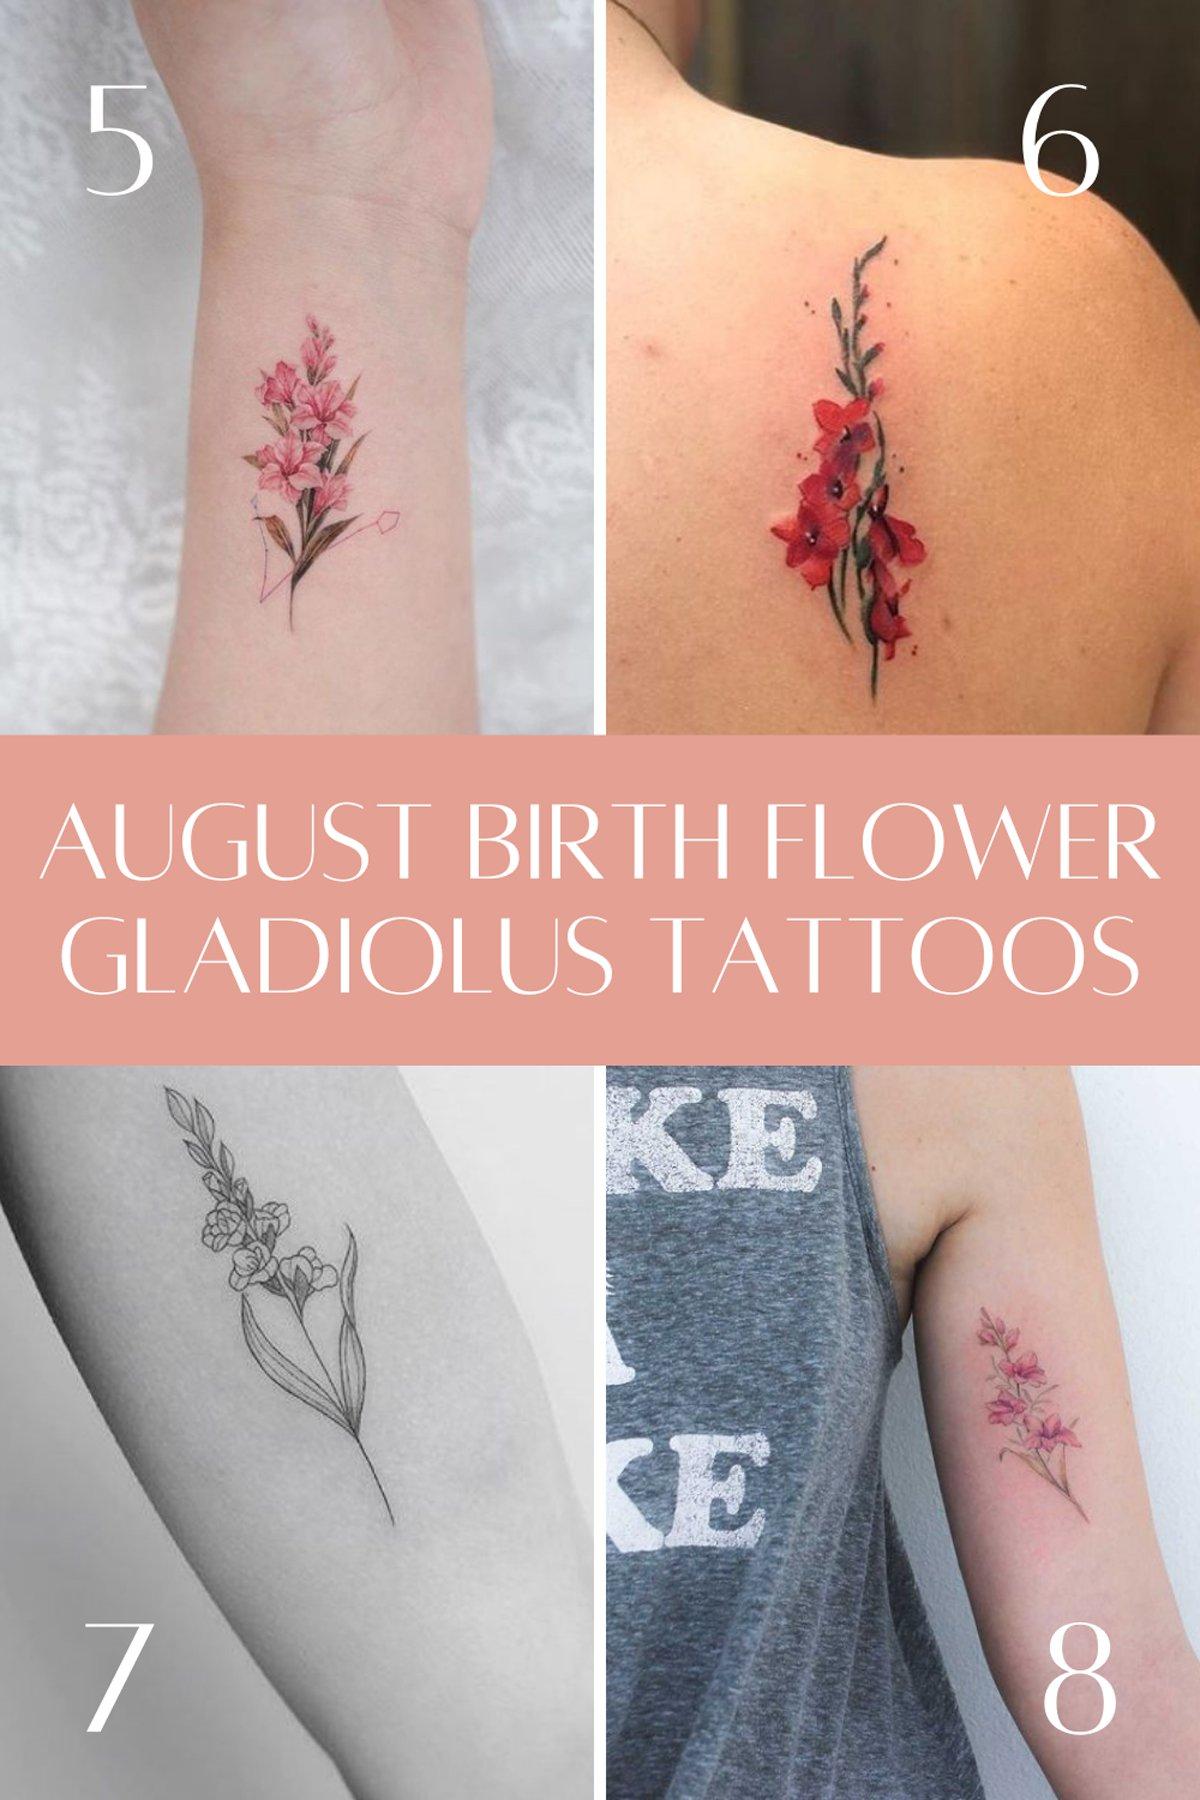 August Birth Flower Gladiolus Tattoos